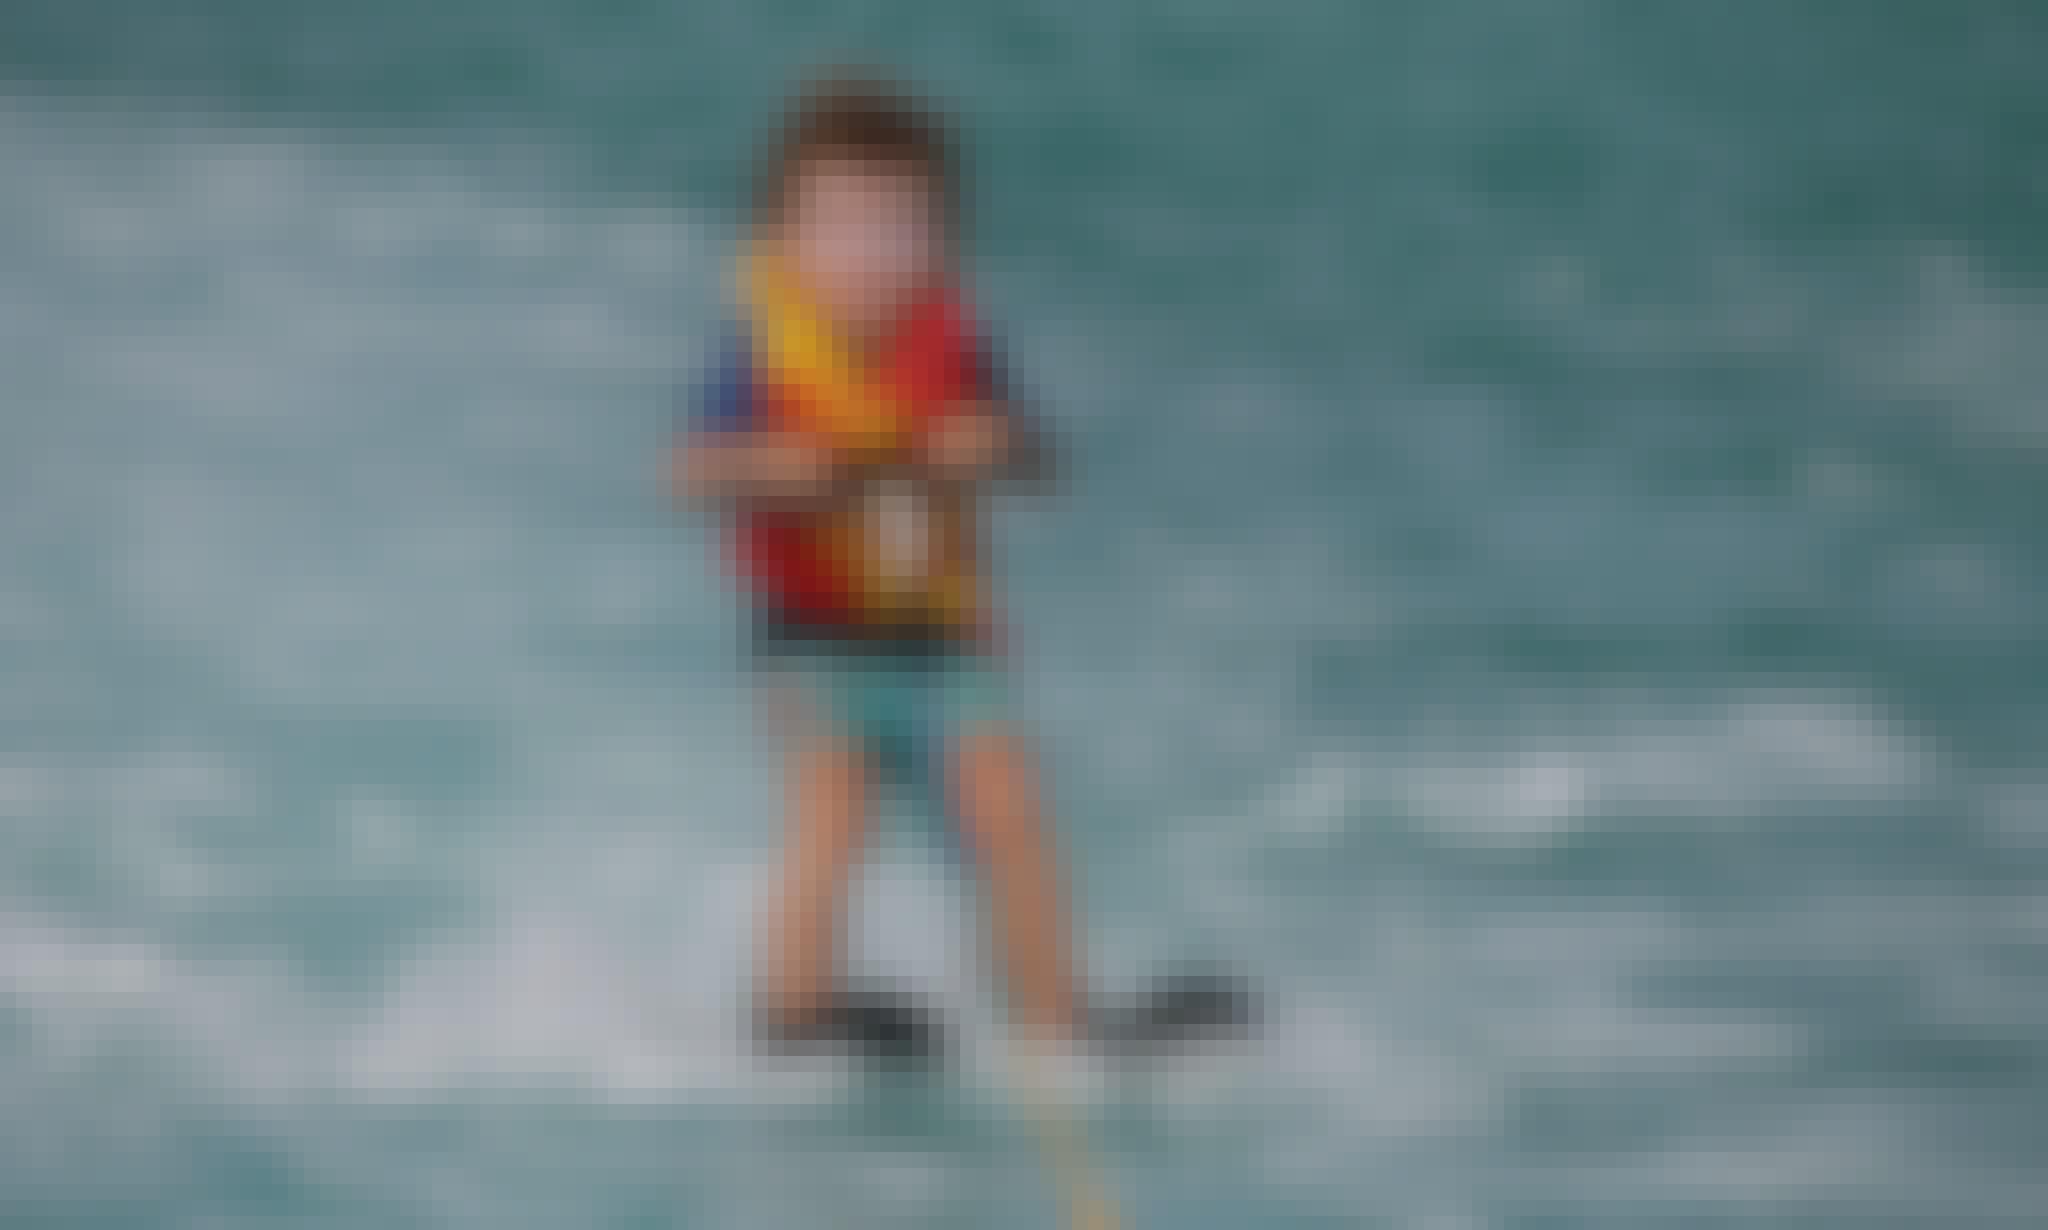 Wakeboarding, Waterskiing, & Tubing, in Turks and Caicos Islands